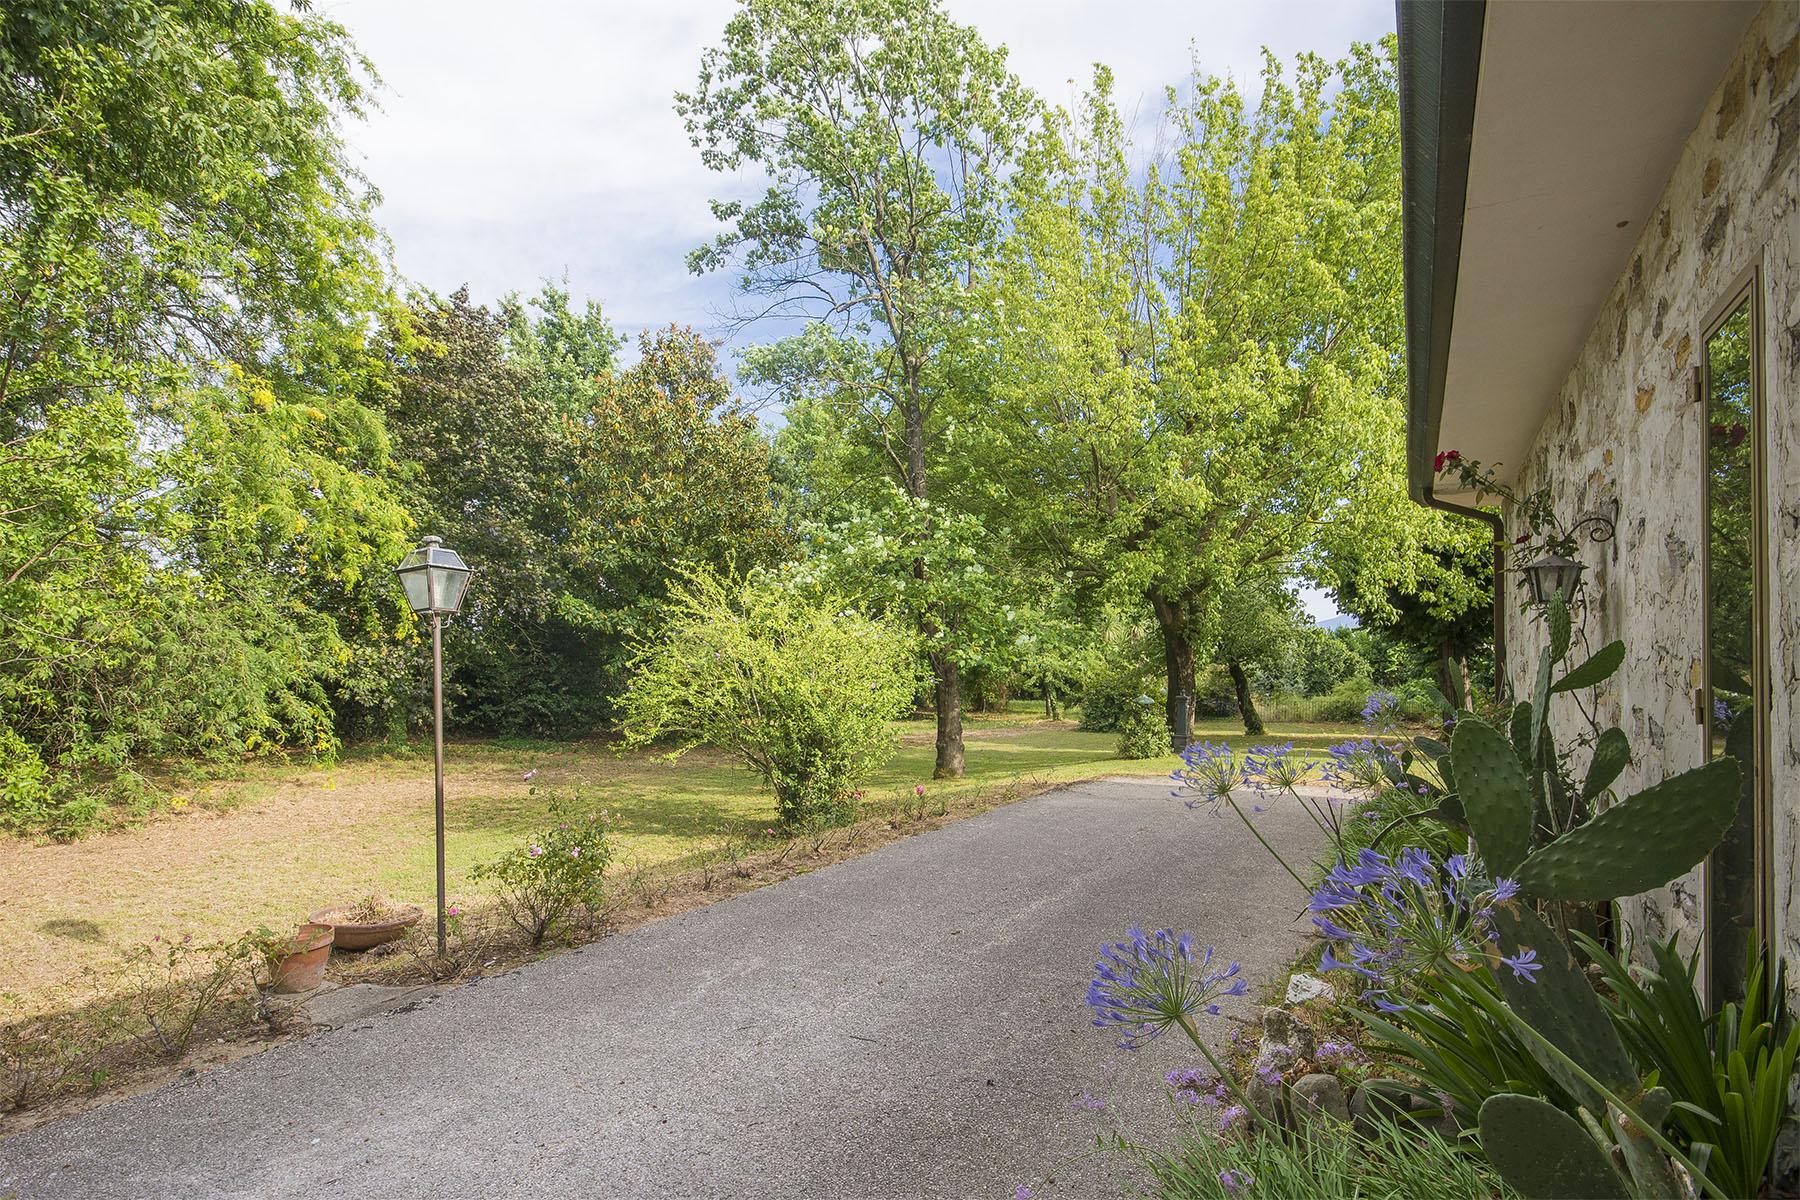 Villa in Vendita a Capannori: 5 locali, 500 mq - Foto 15